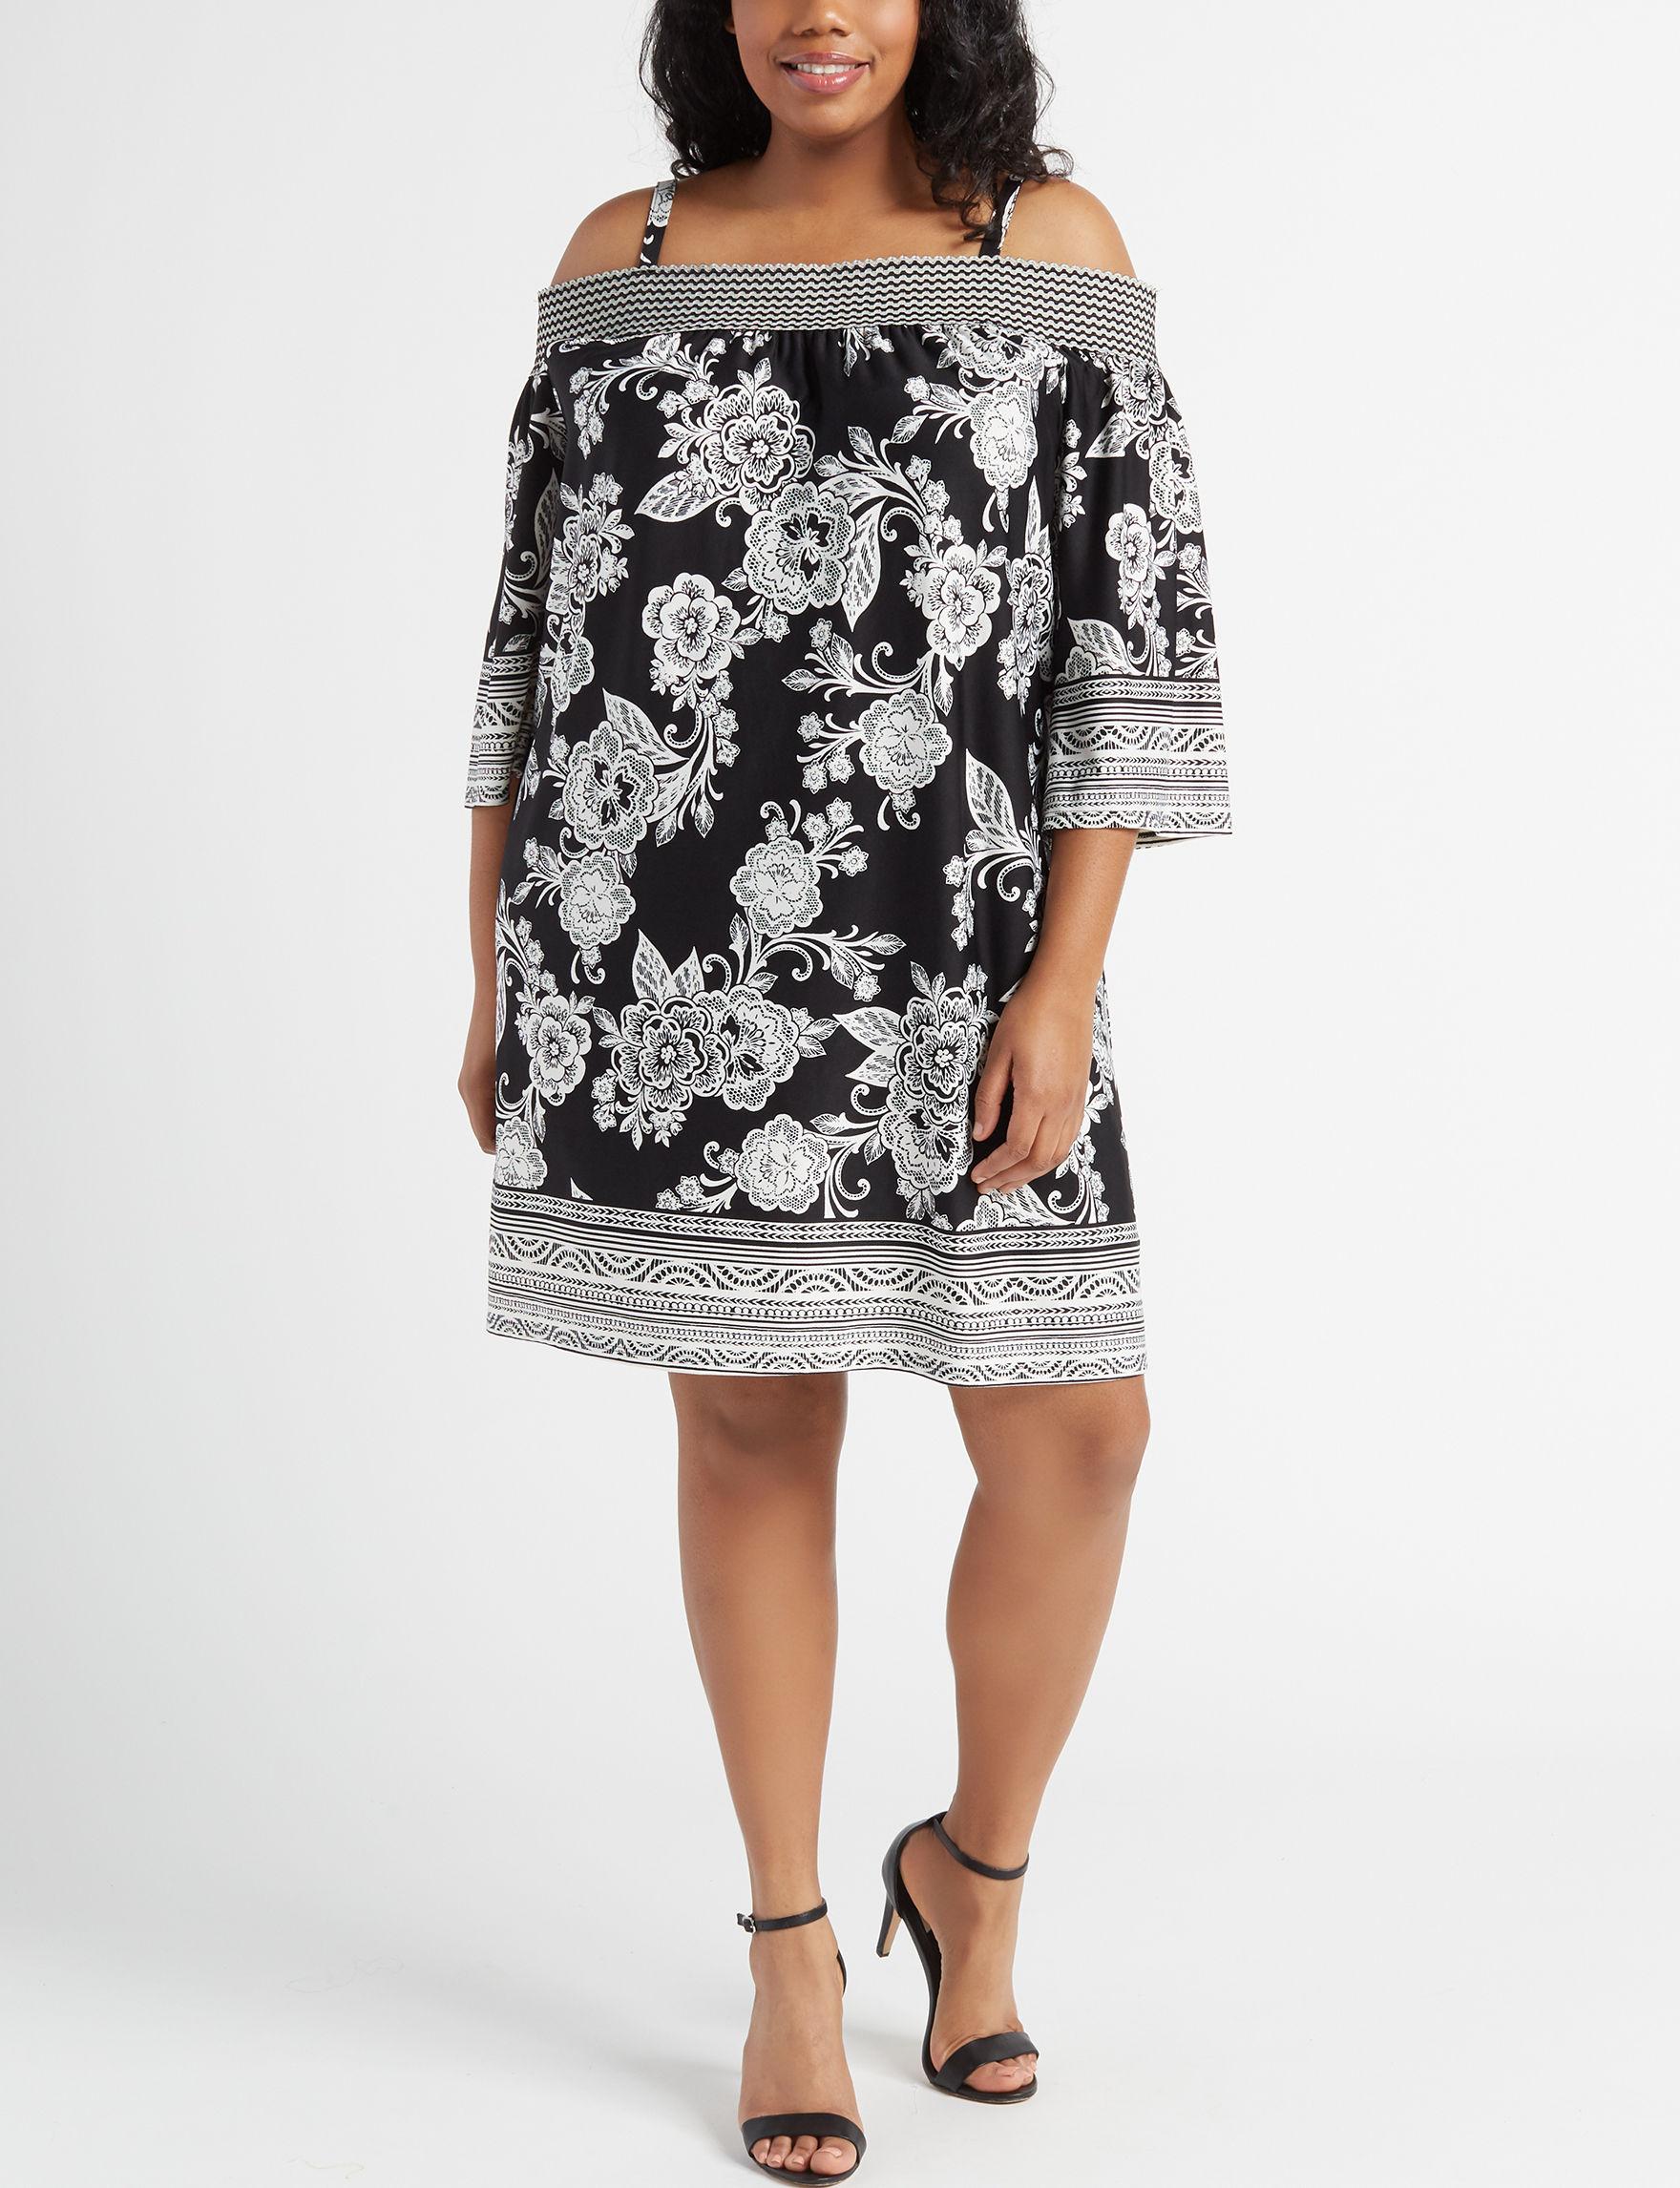 Trixxi Black Everyday & Casual Shift Dresses